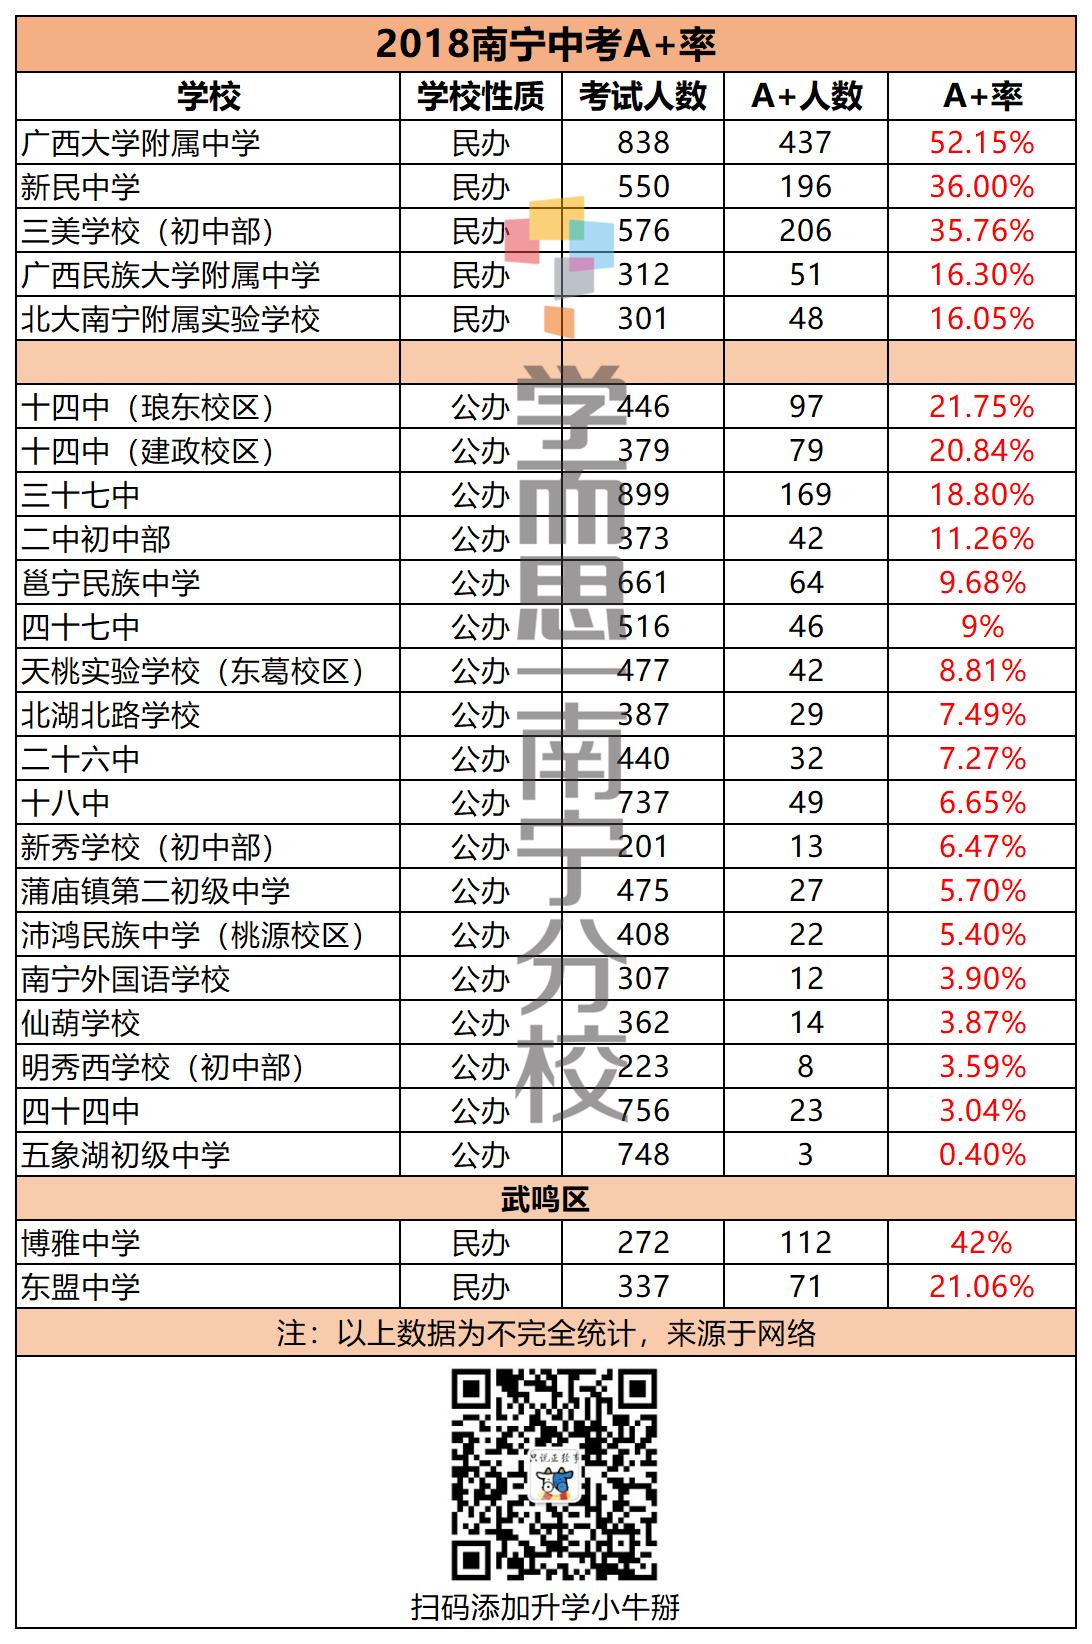 2018中考A 率_副本.png